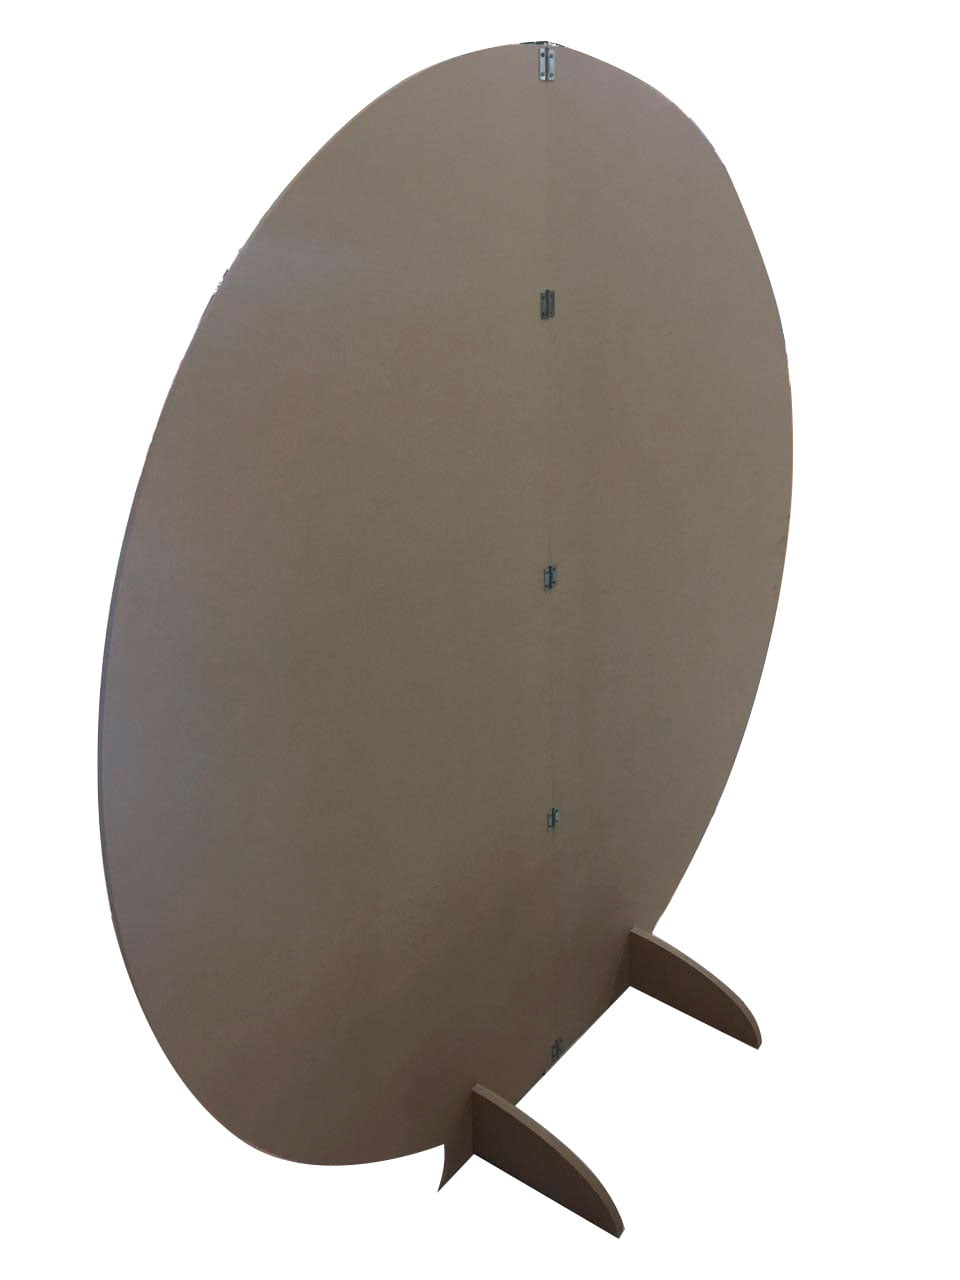 Painel Redondo em MDF - 1,80m